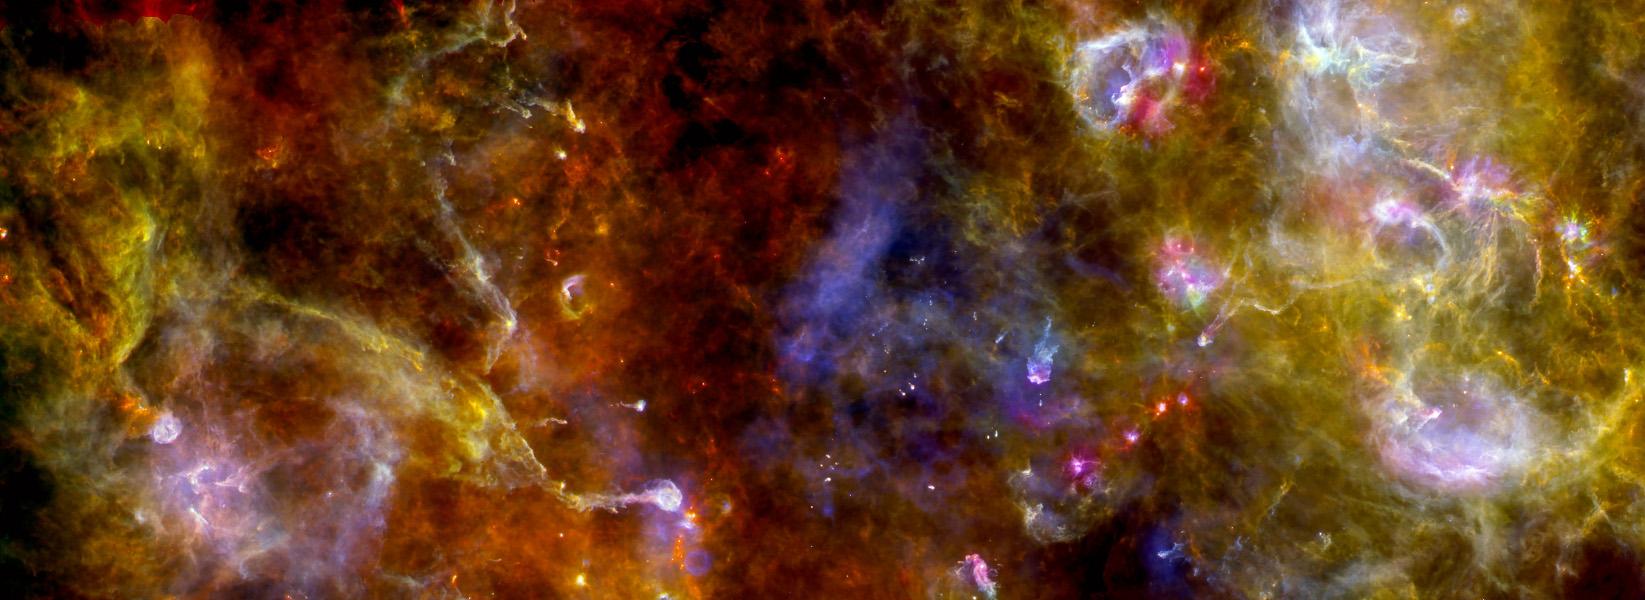 Cygnus X por el Observatorio Herschel